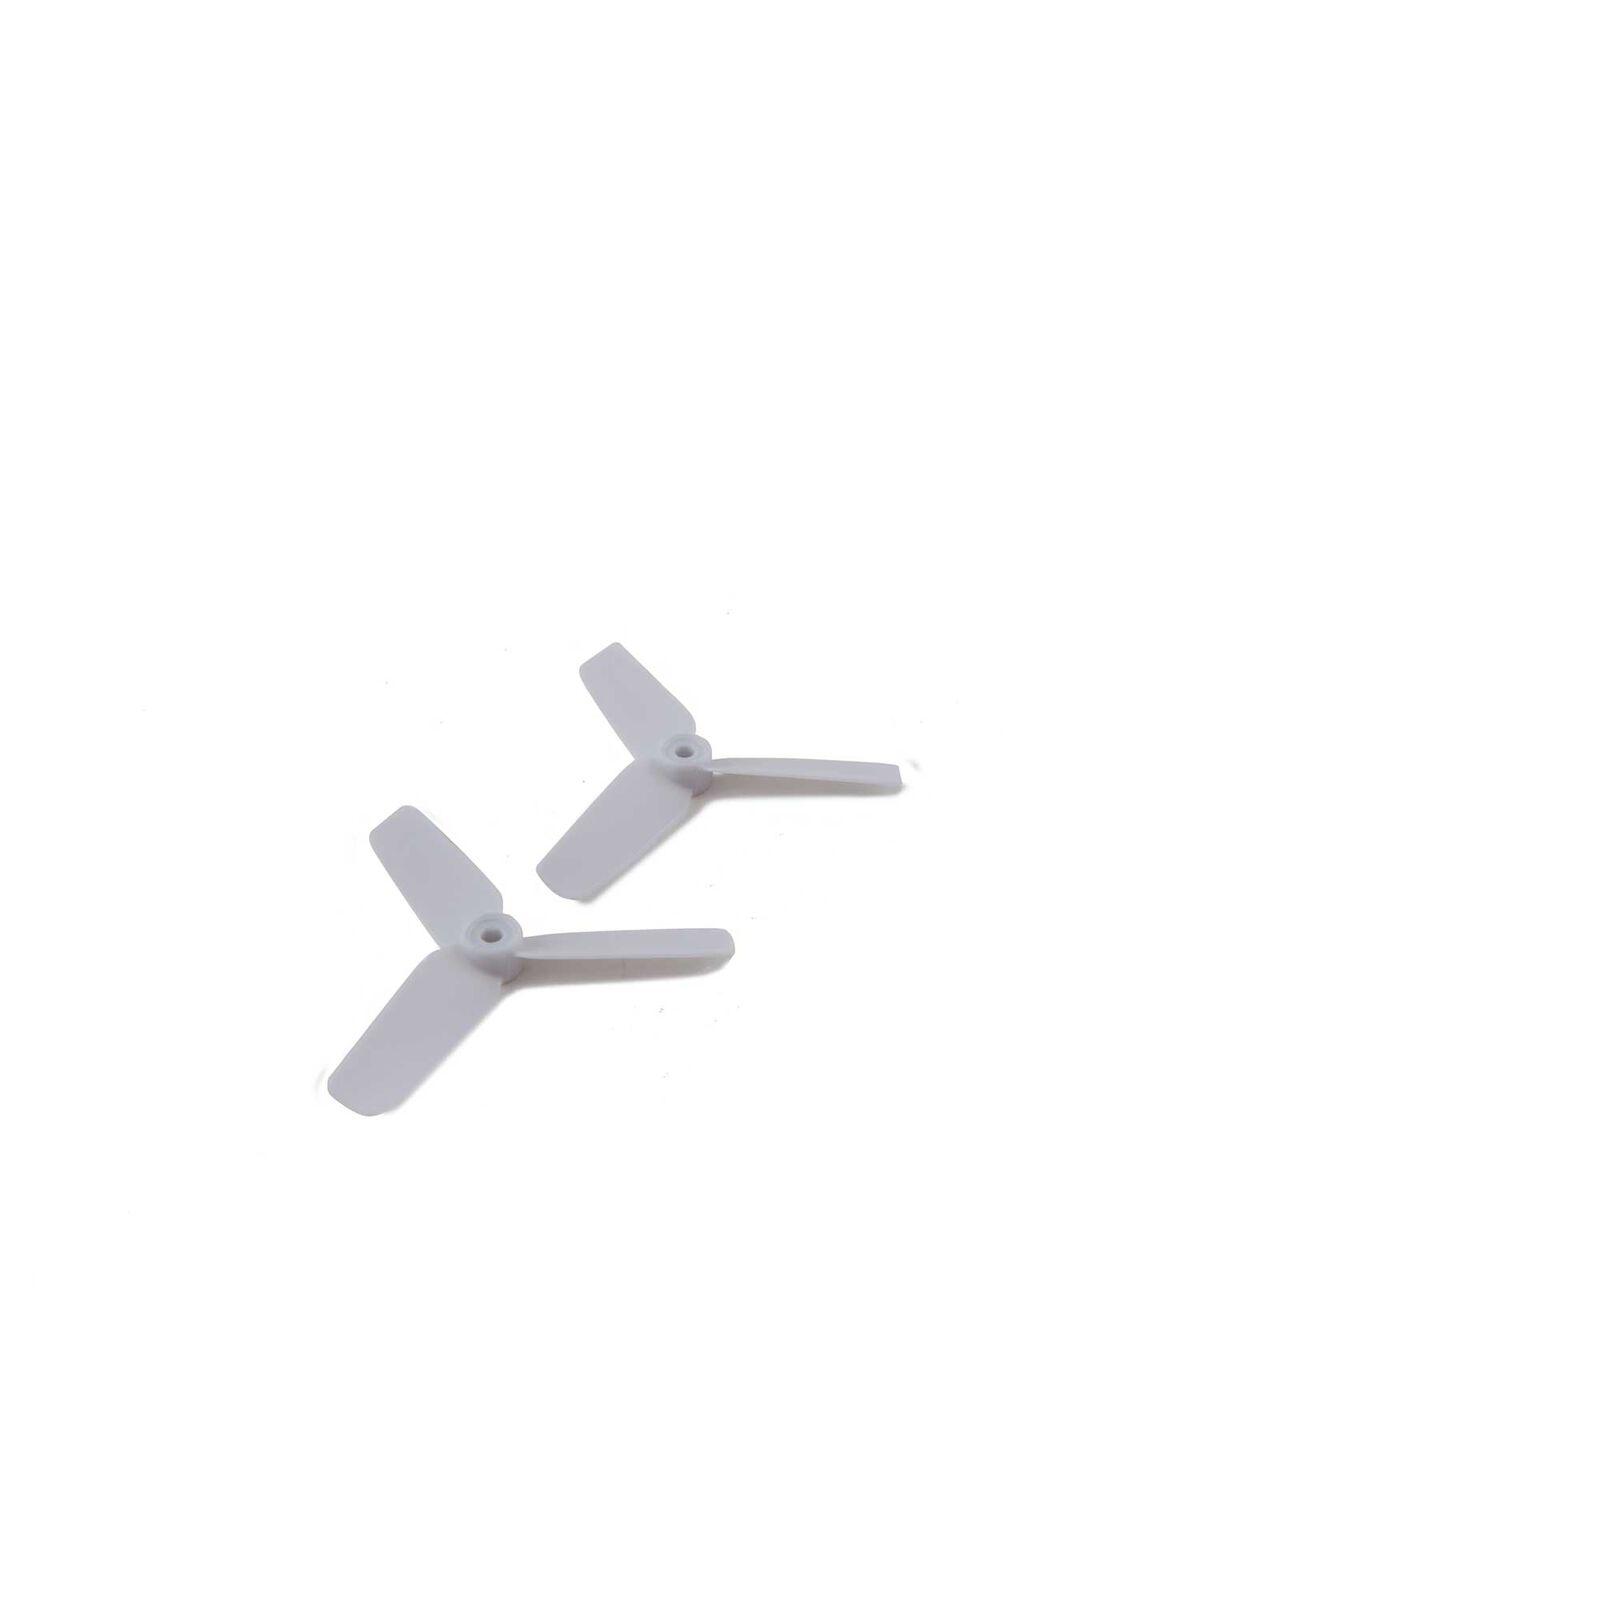 Tail Rotor Blade Set: 130 S, 150 S